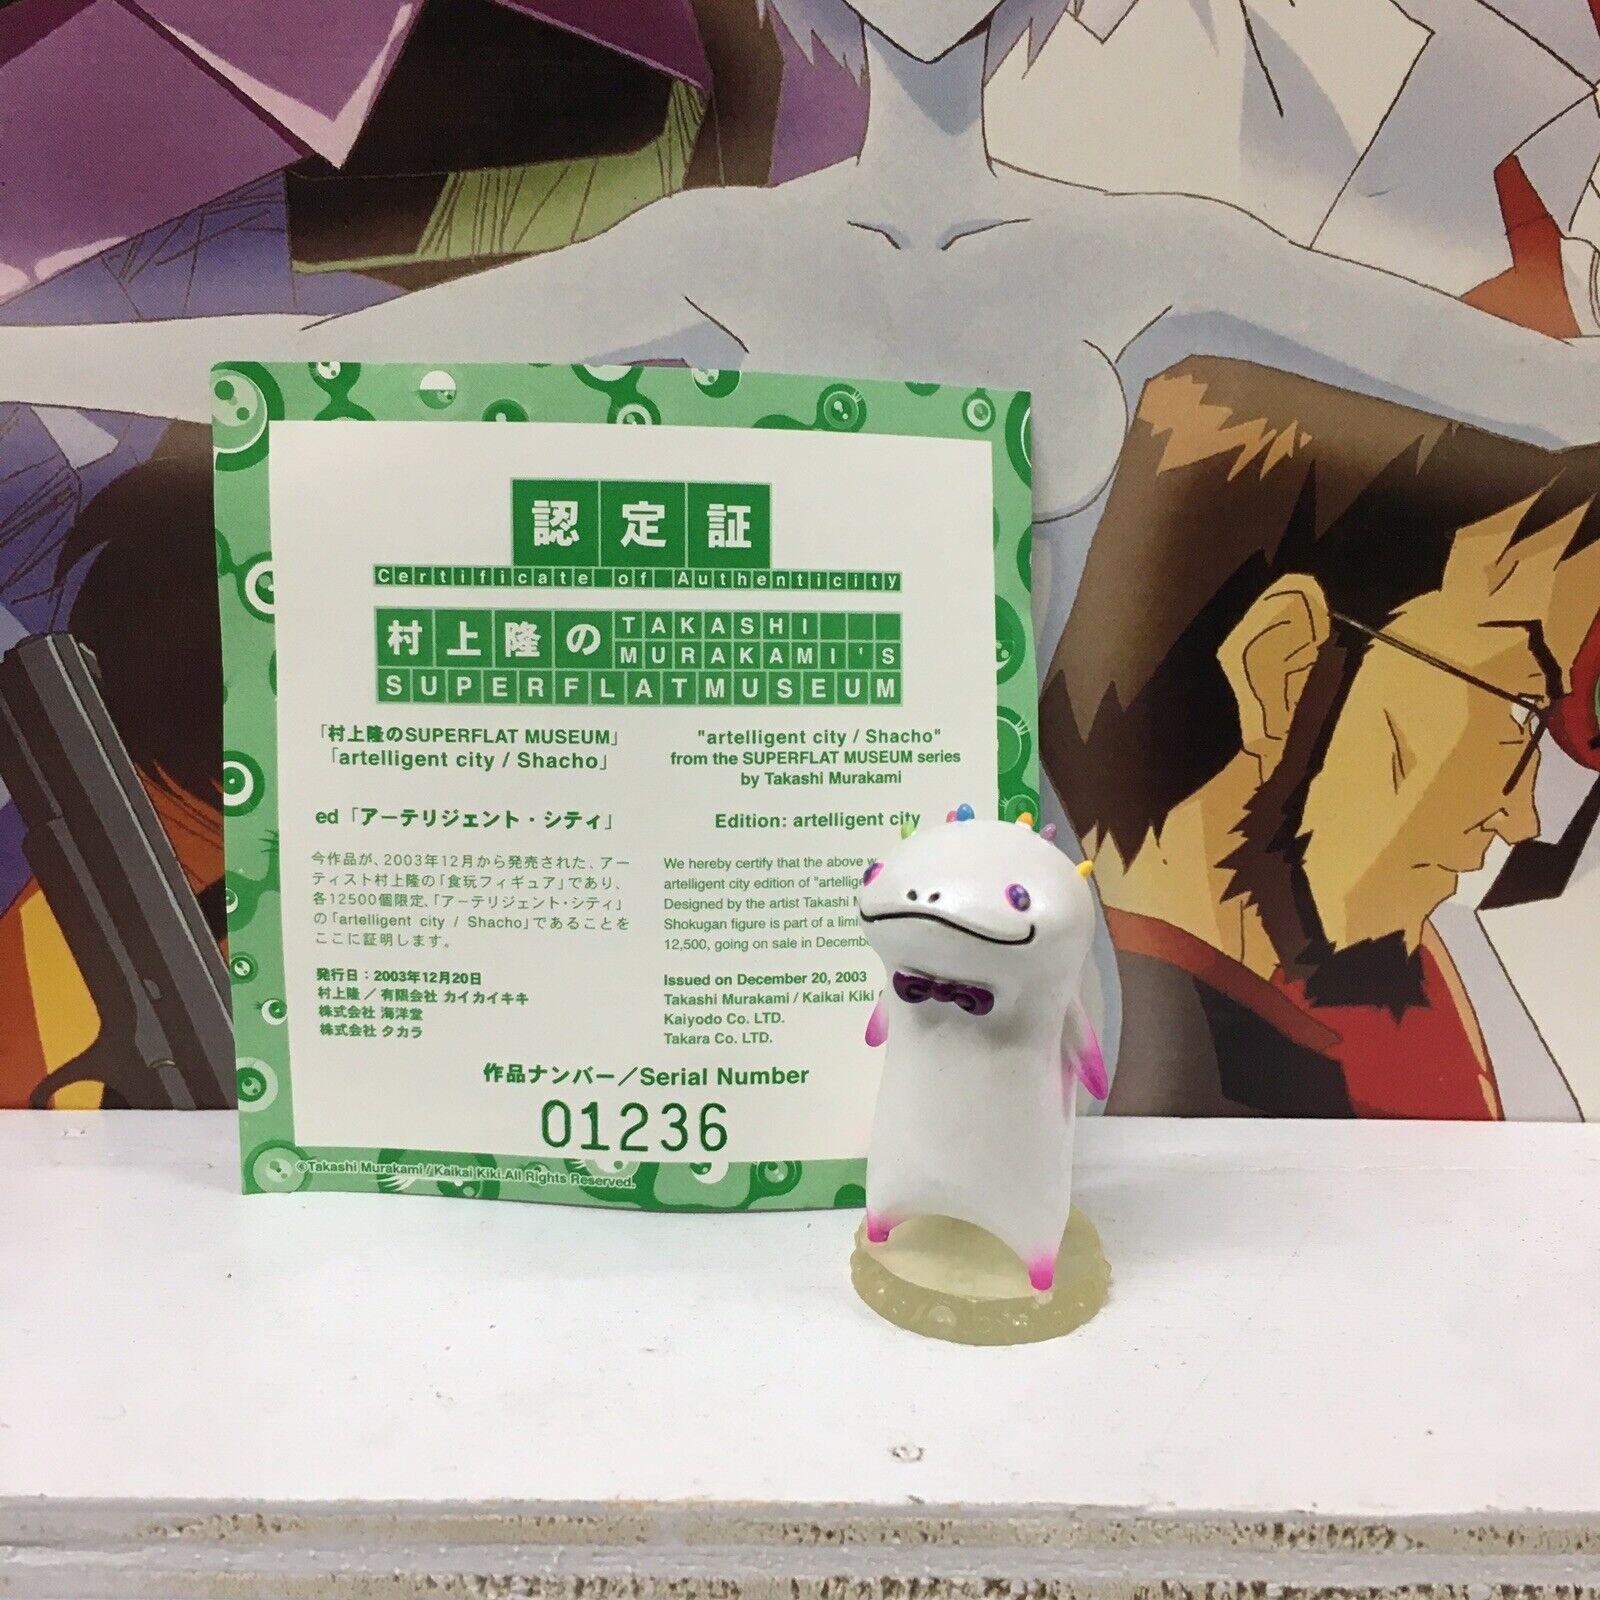 Rare TAKASHI MURAKAMI SUPERFLAT MUSEUM Figure shacho artelligent edi toy print